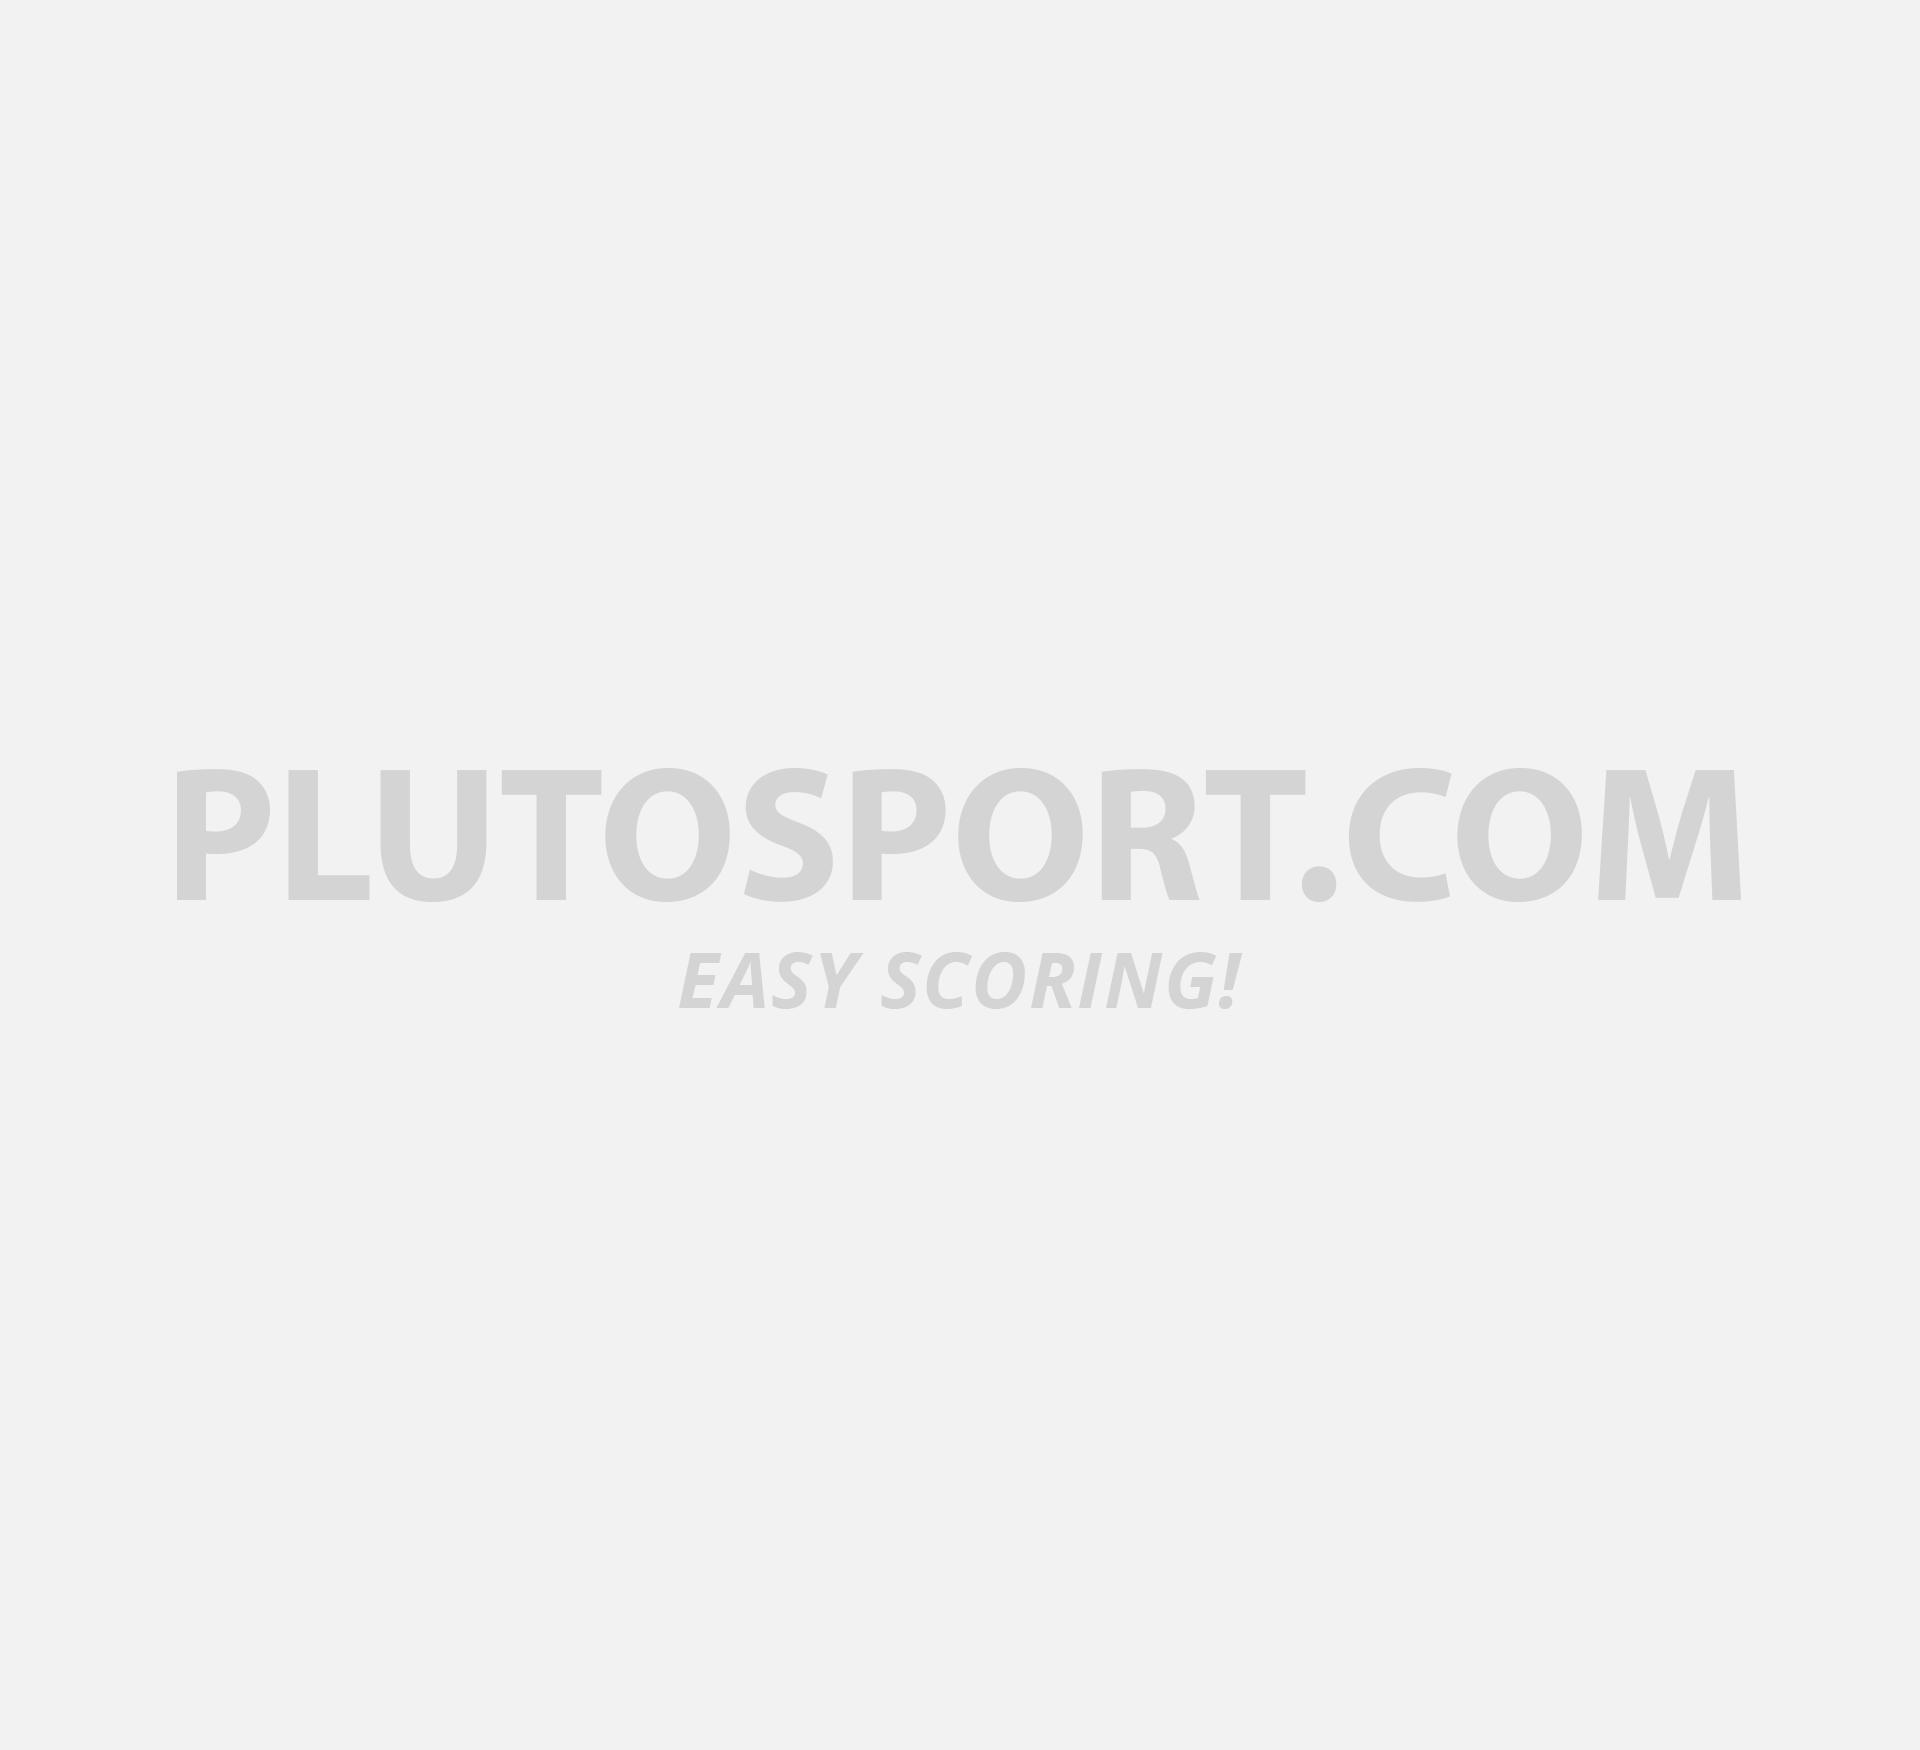 adb4e1288647 Puma King Rain Jacket - Windbreakers - Clothing - Football - Teamwear Shop  - Sports